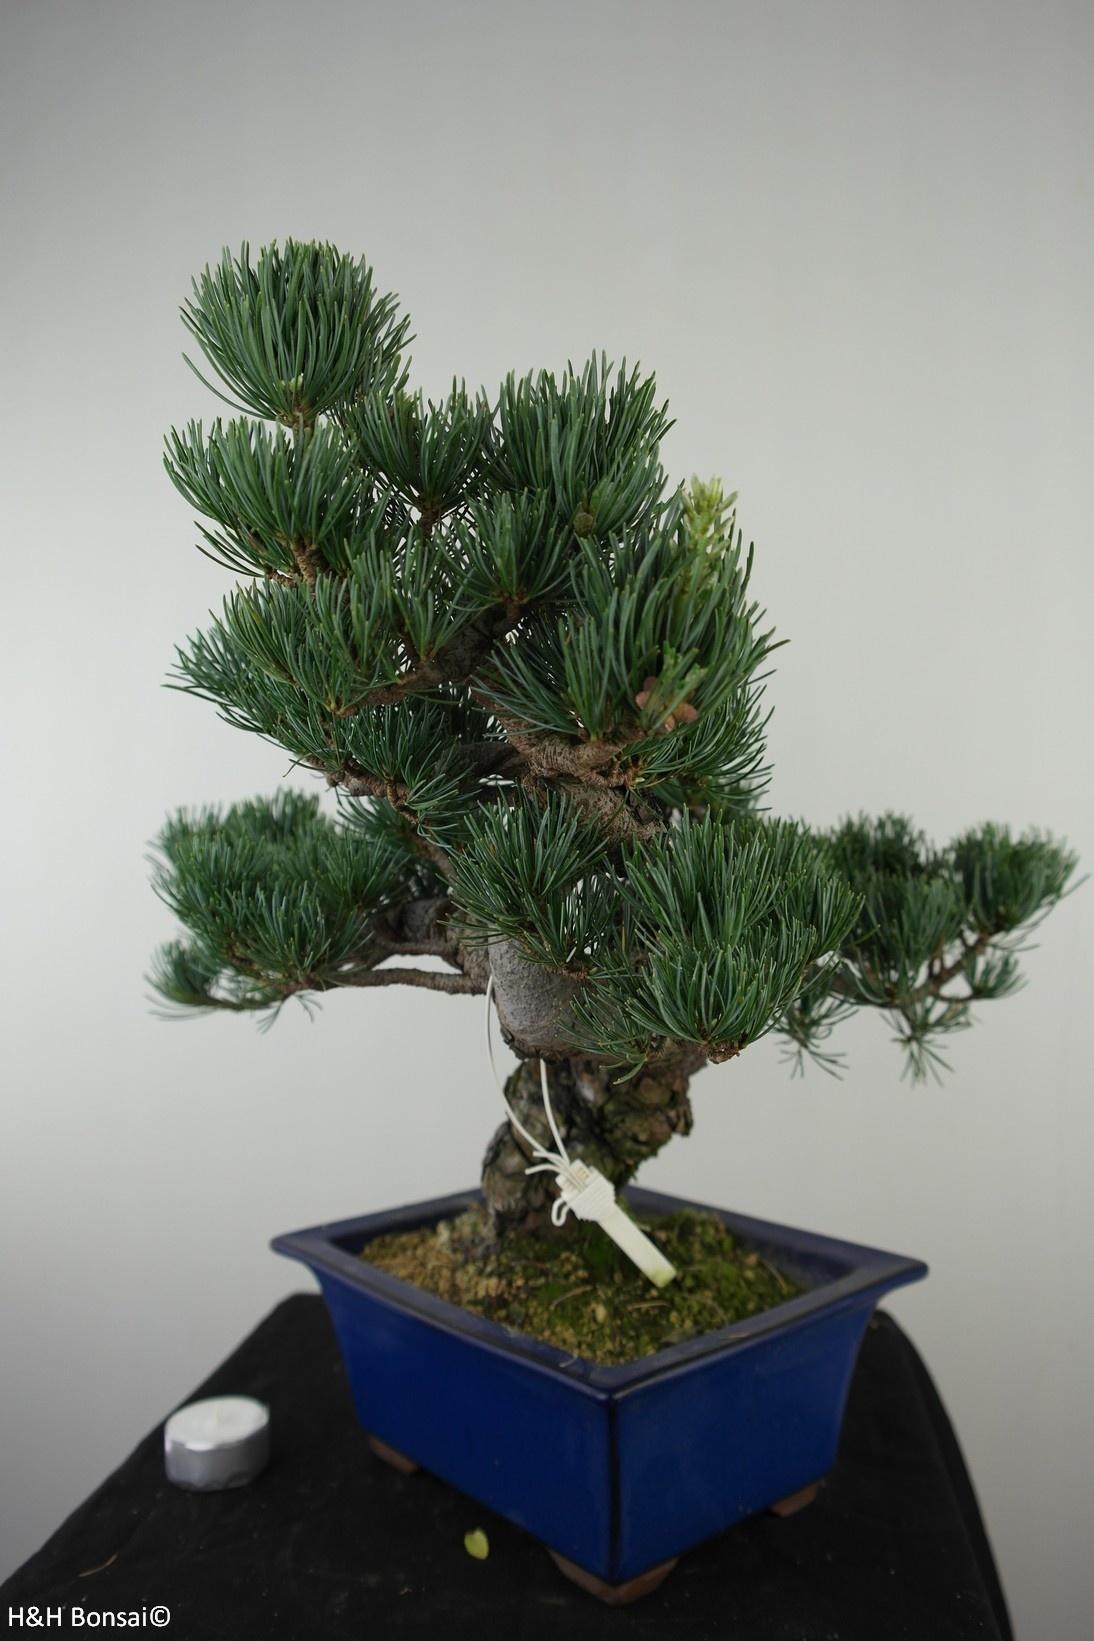 Bonsai Mädchenkiefer, Pinus pentaphylla, nr. 7810